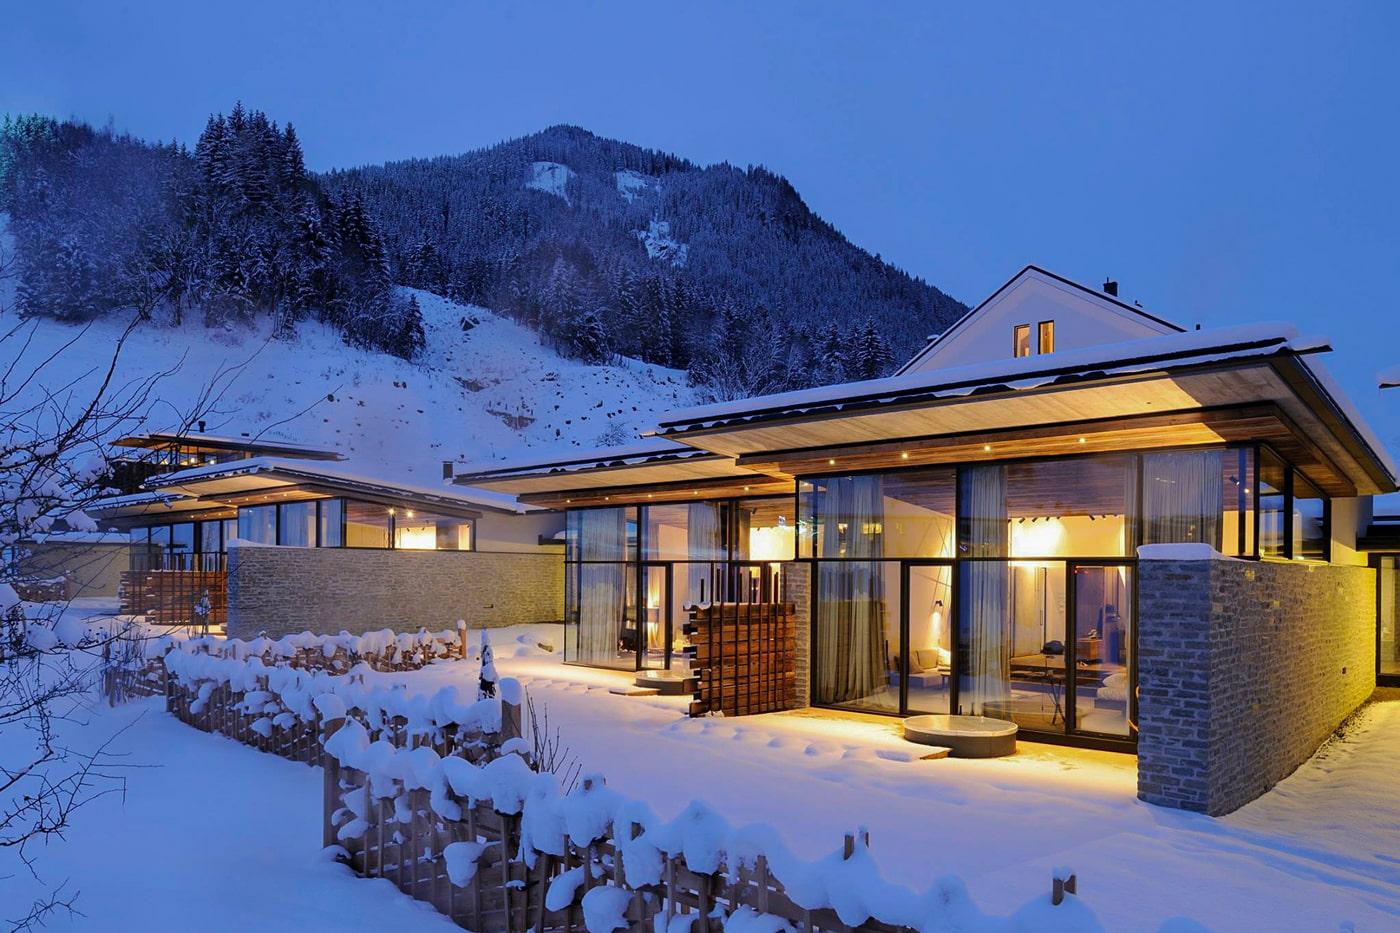 Winter hotel in Austria